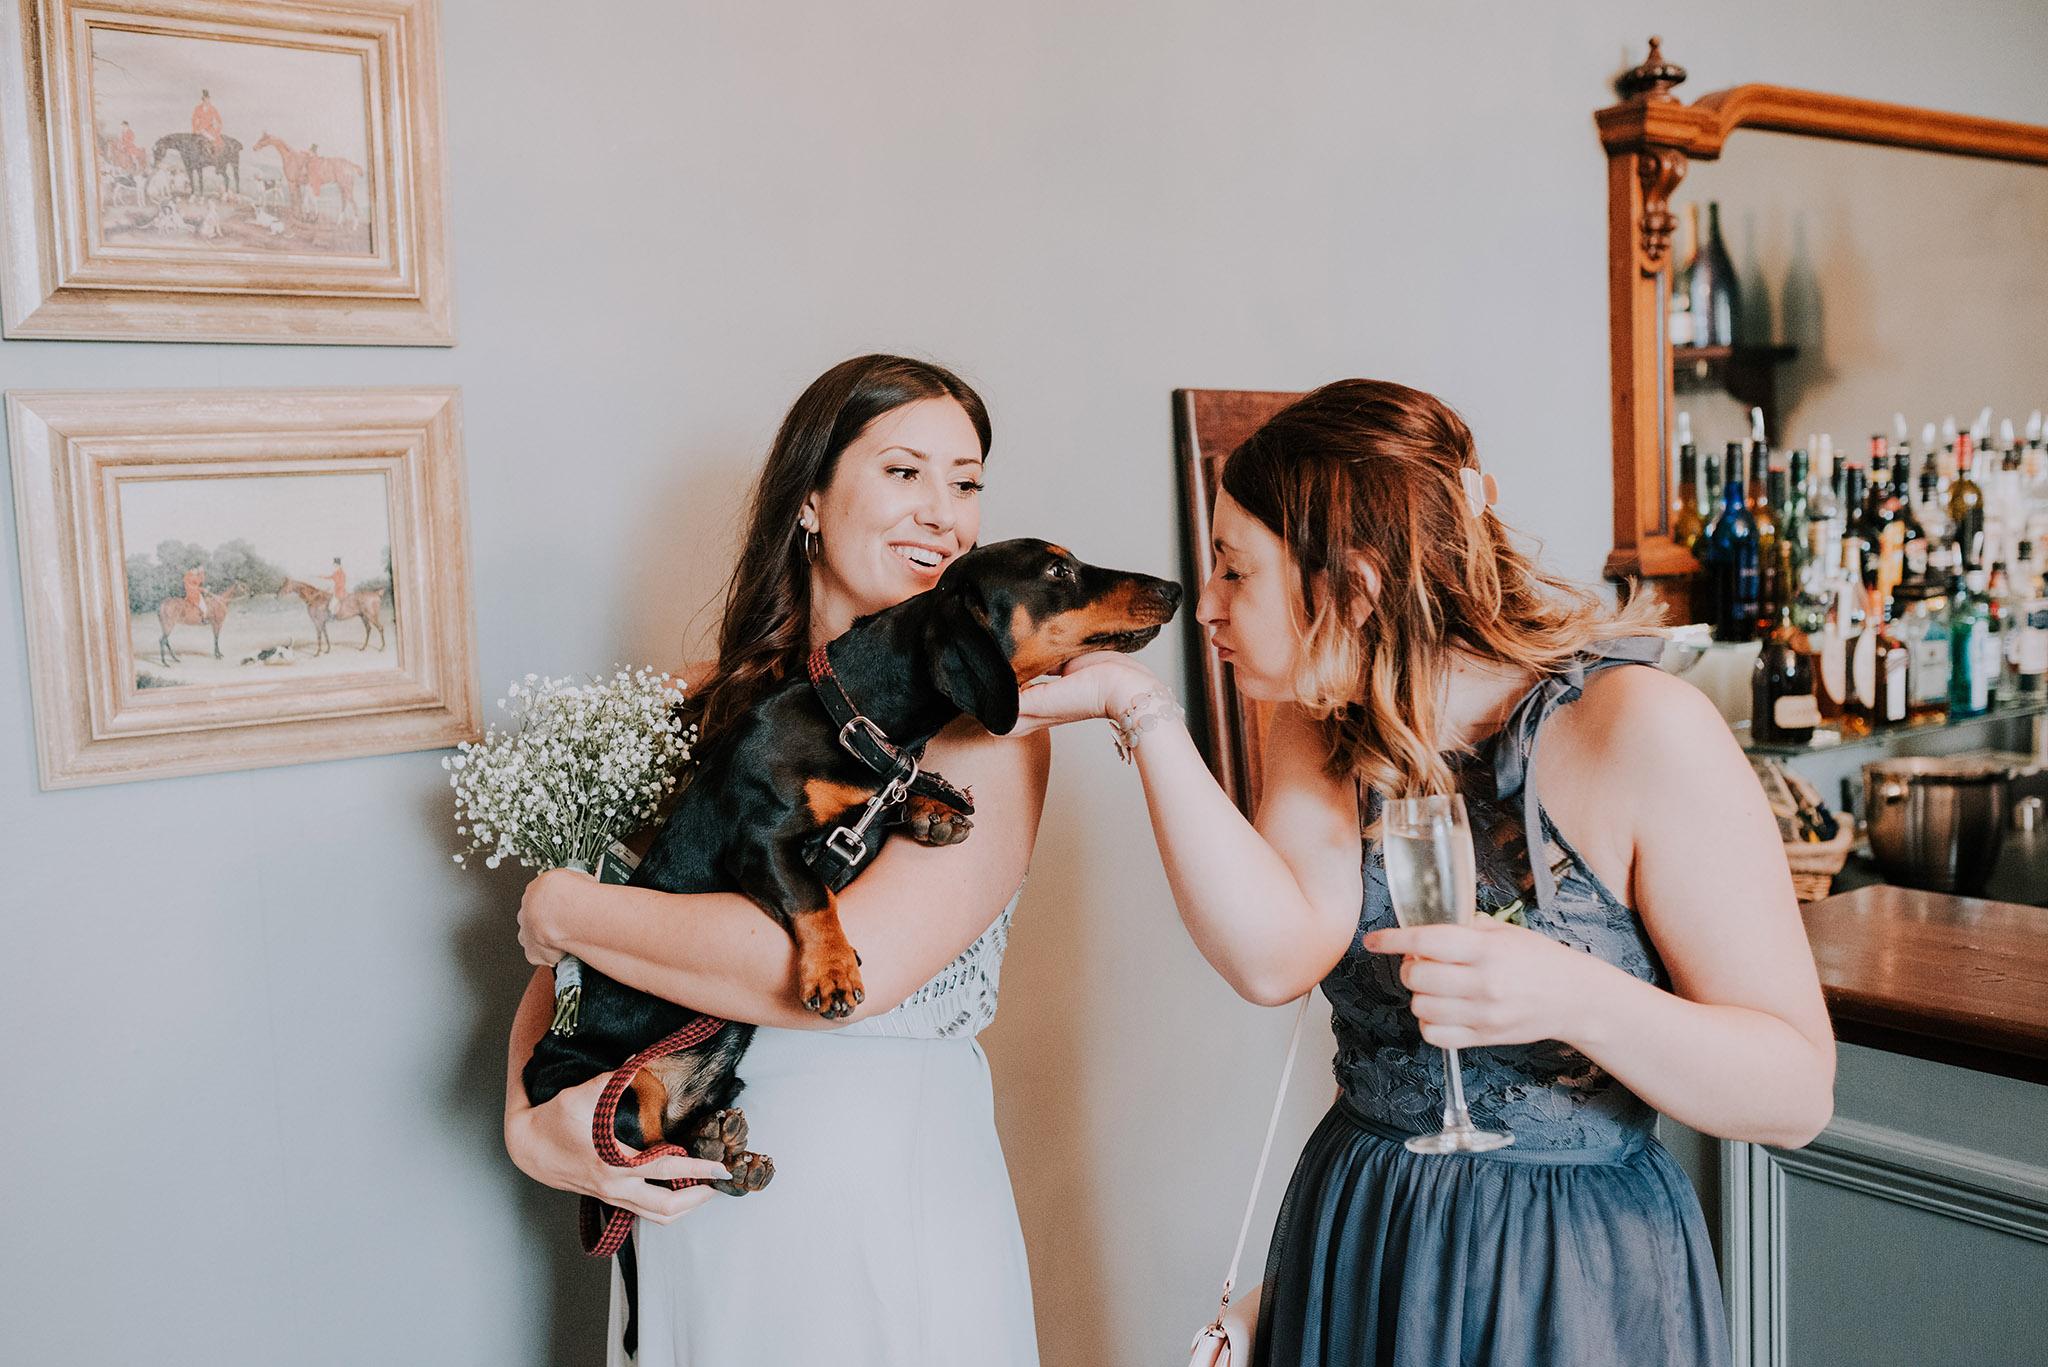 scott-stockwell-photography-wedding-004.jpg